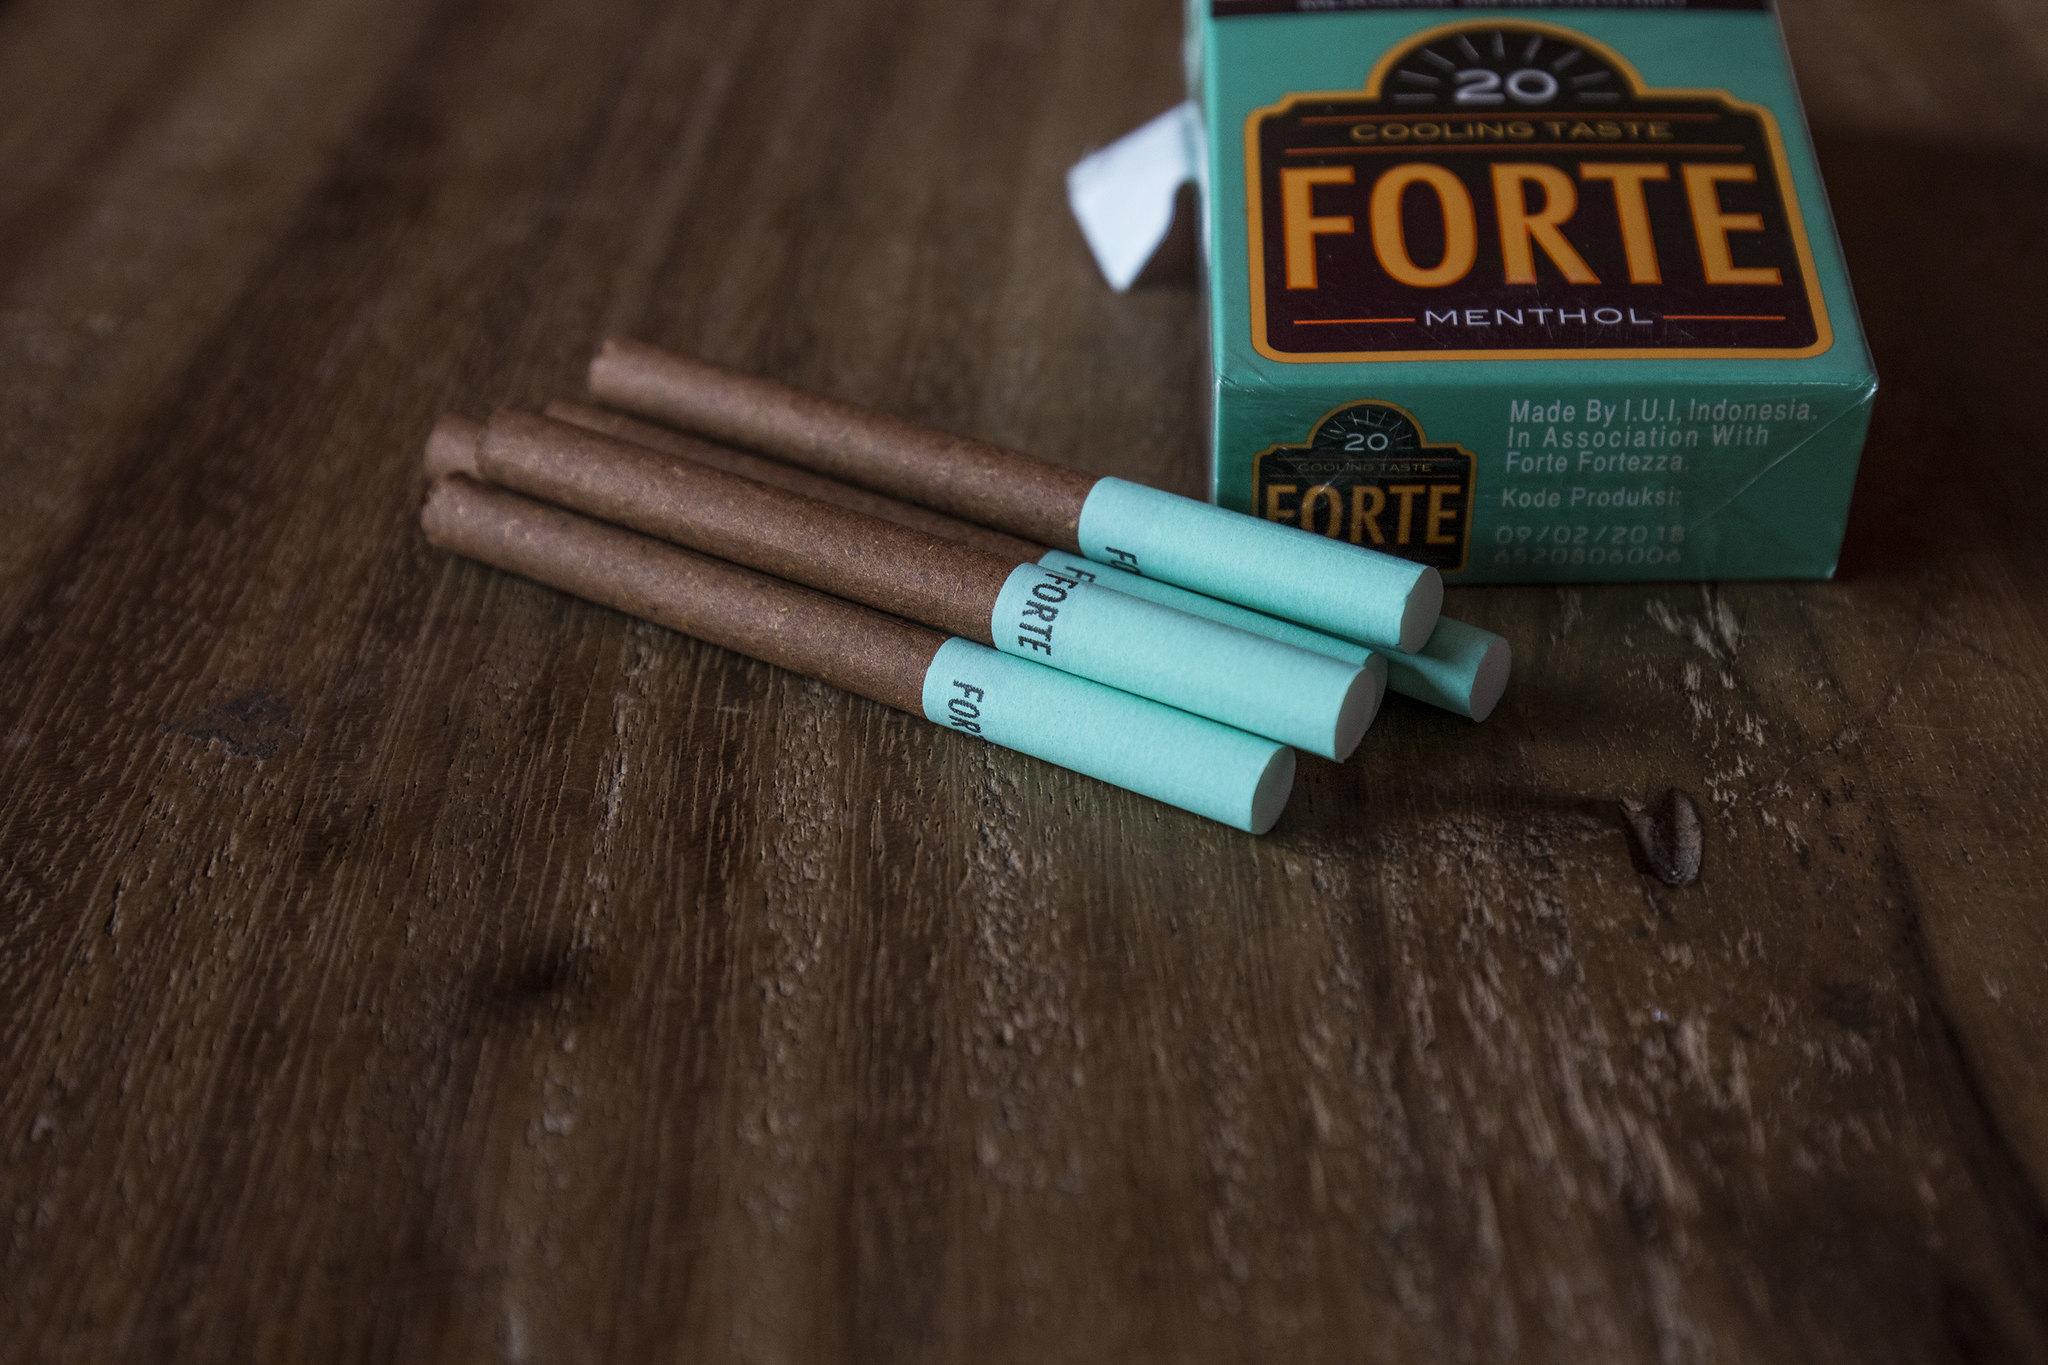 Djarum Forte